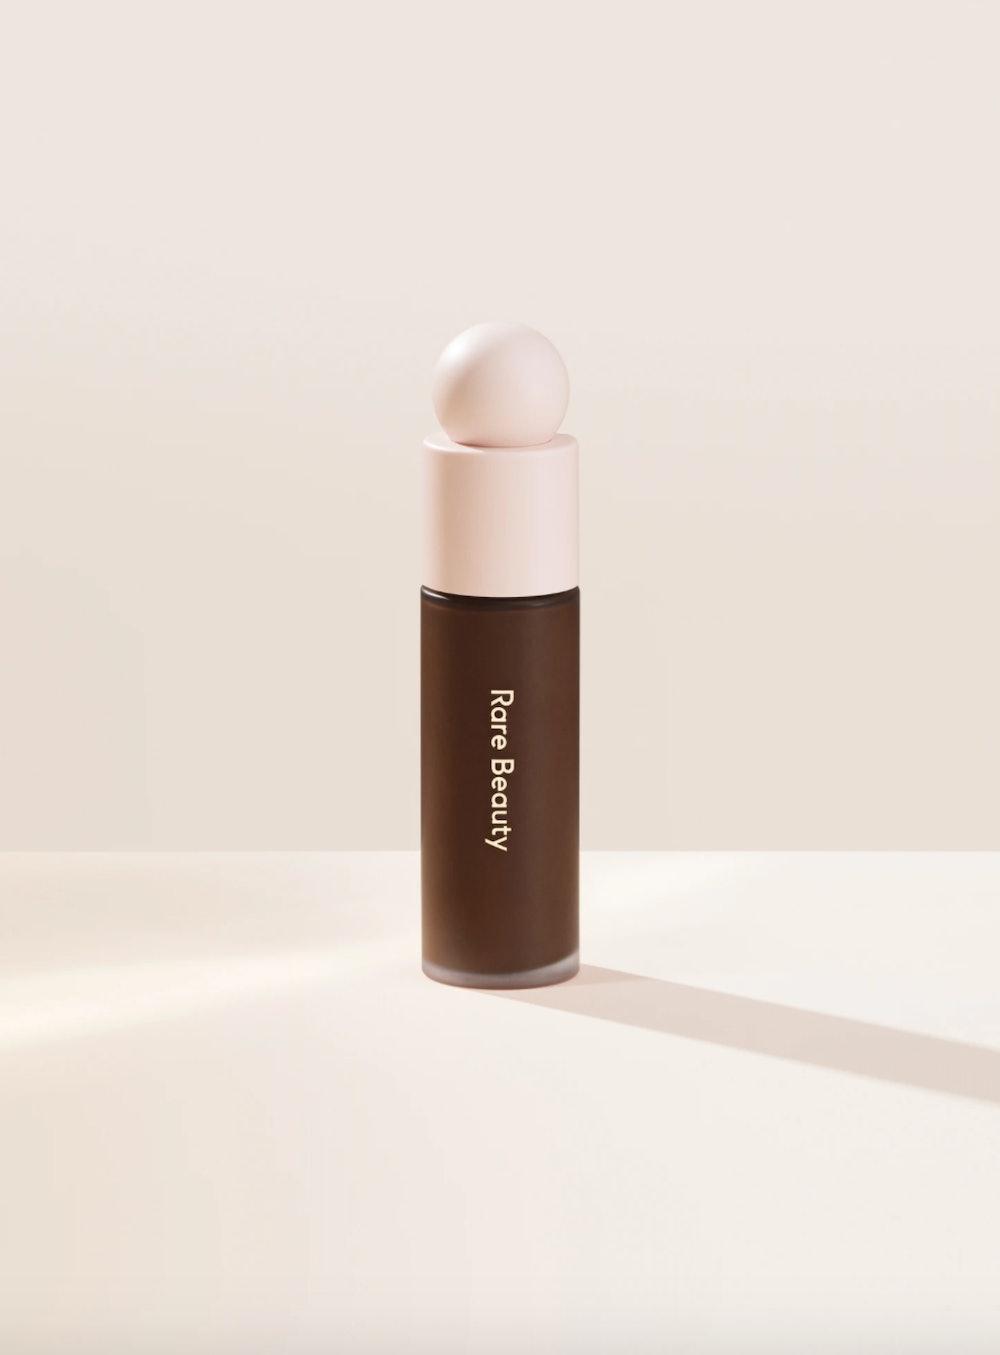 Rare Beauty Liquid Touch Weightless Foundation